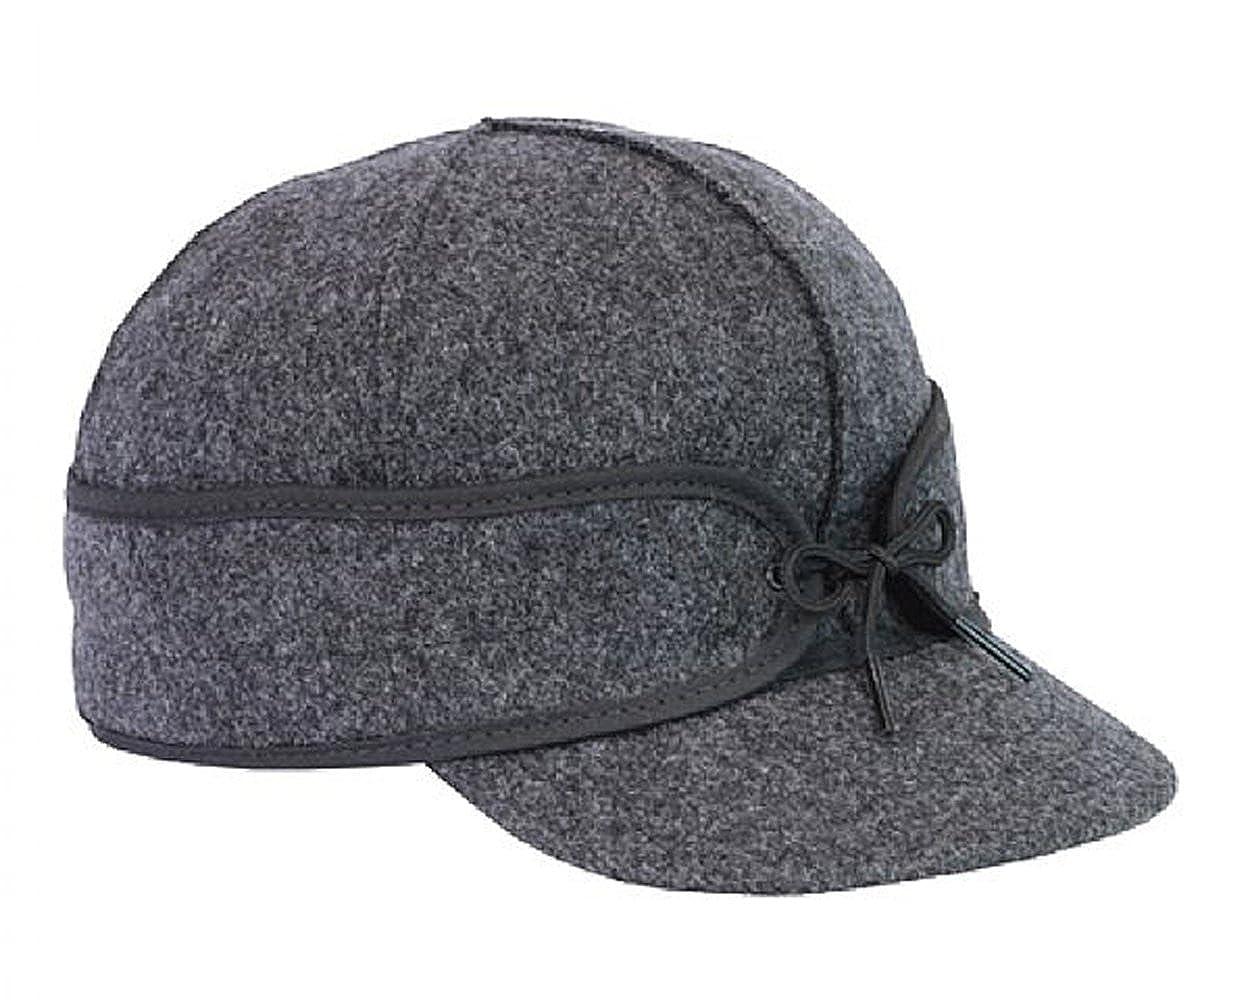 393ce5663ba Stormy Kromer Men s Mackinaw Wool Cap at Amazon Men s Clothing store